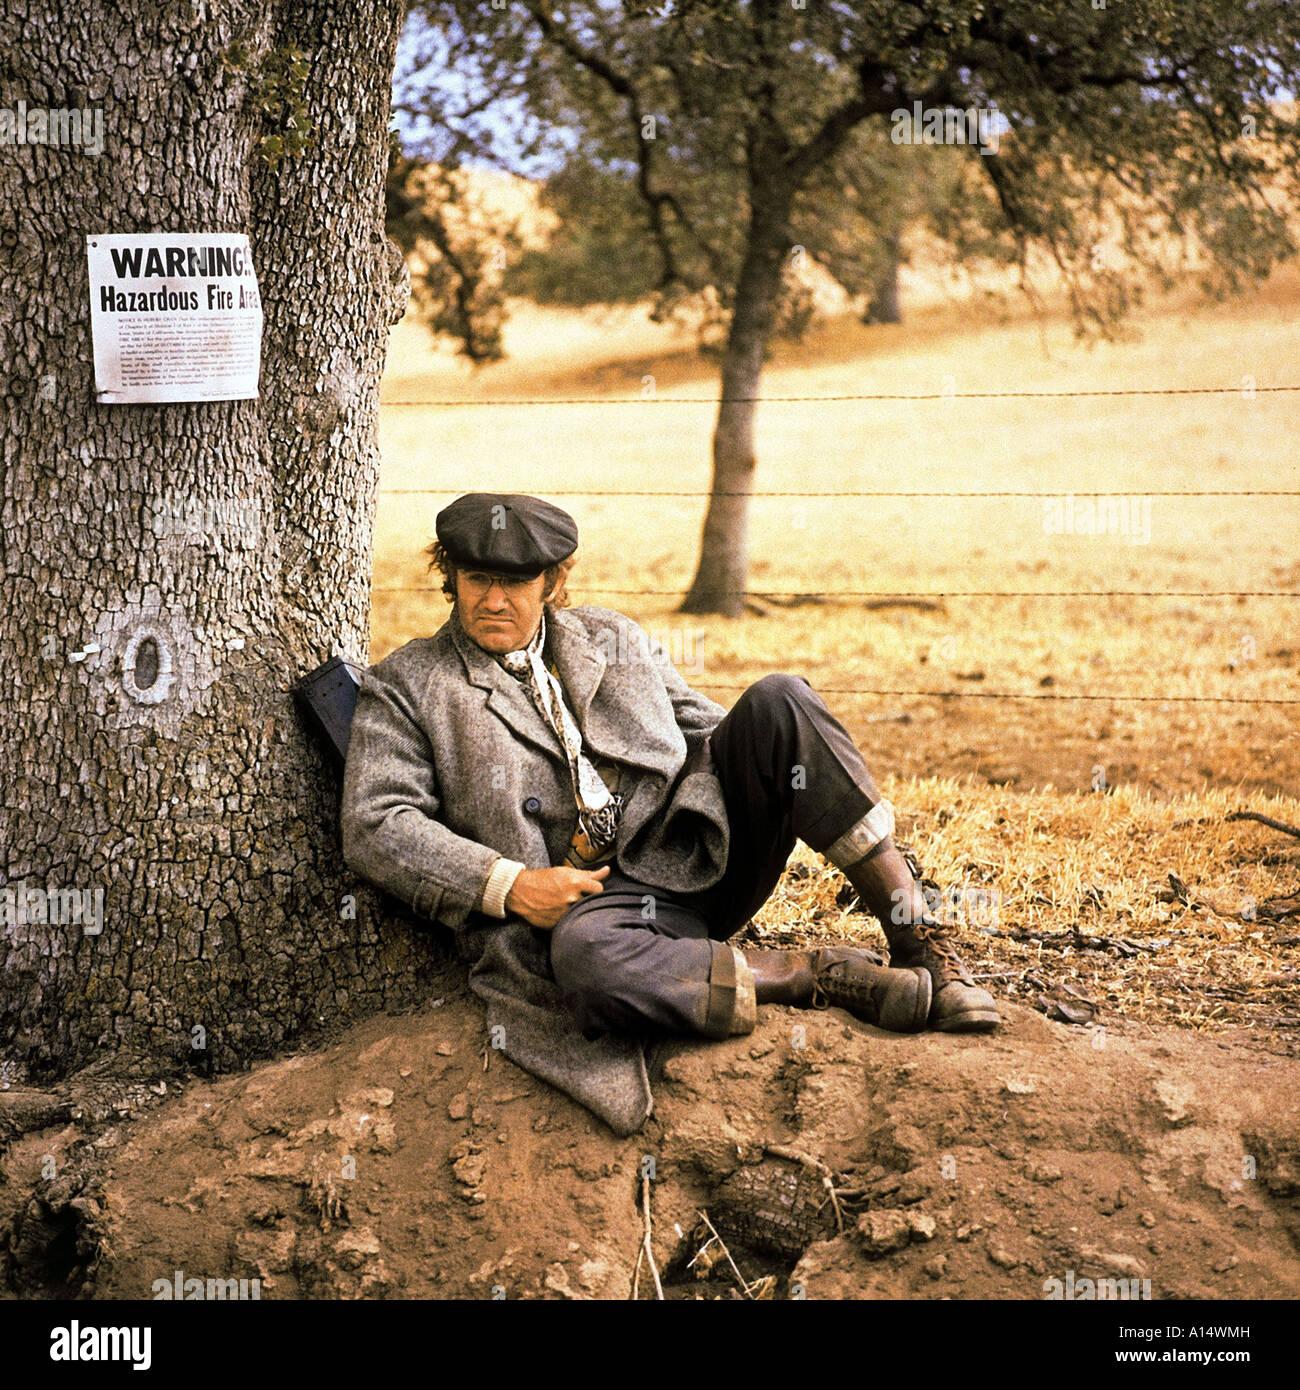 Scarecrow 1973 Jerry Schatzberg Gene Hackman Grand Prize at the 1973 Cannes International Film Festival ex aequo - Stock Image